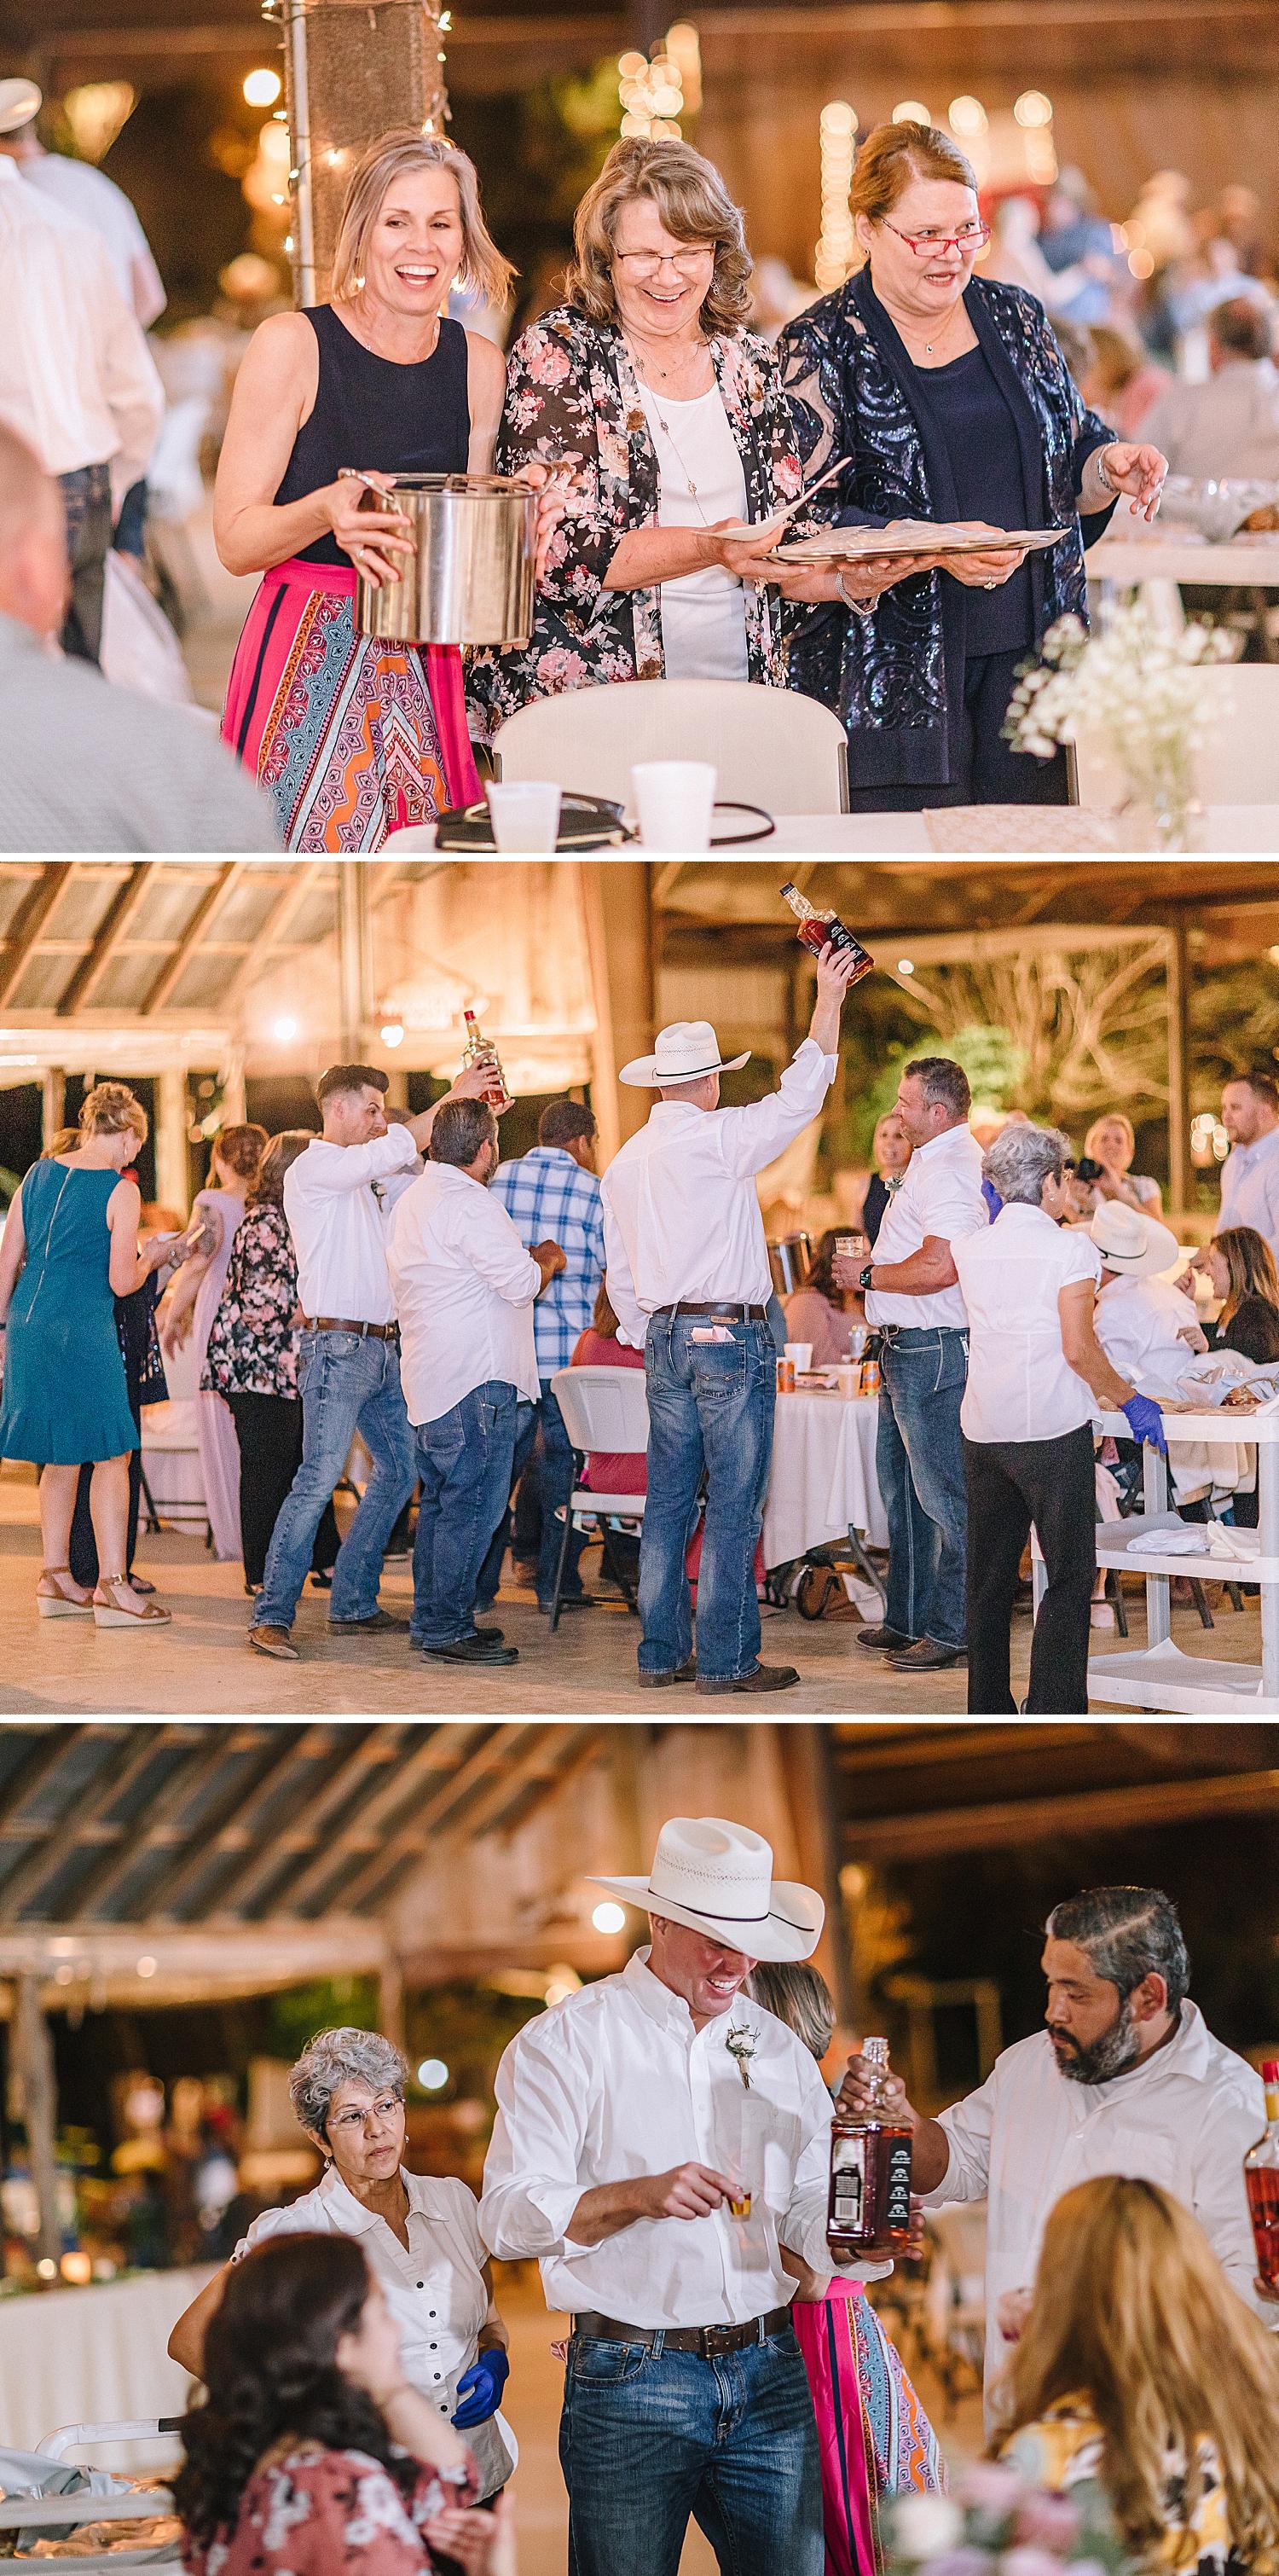 Rio-Cibilo-Ranch-Marion-Texas-Wedding-Rustic-Blush-Rose-Quartz-Details-Carly-Barton-Photography_0115.jpg